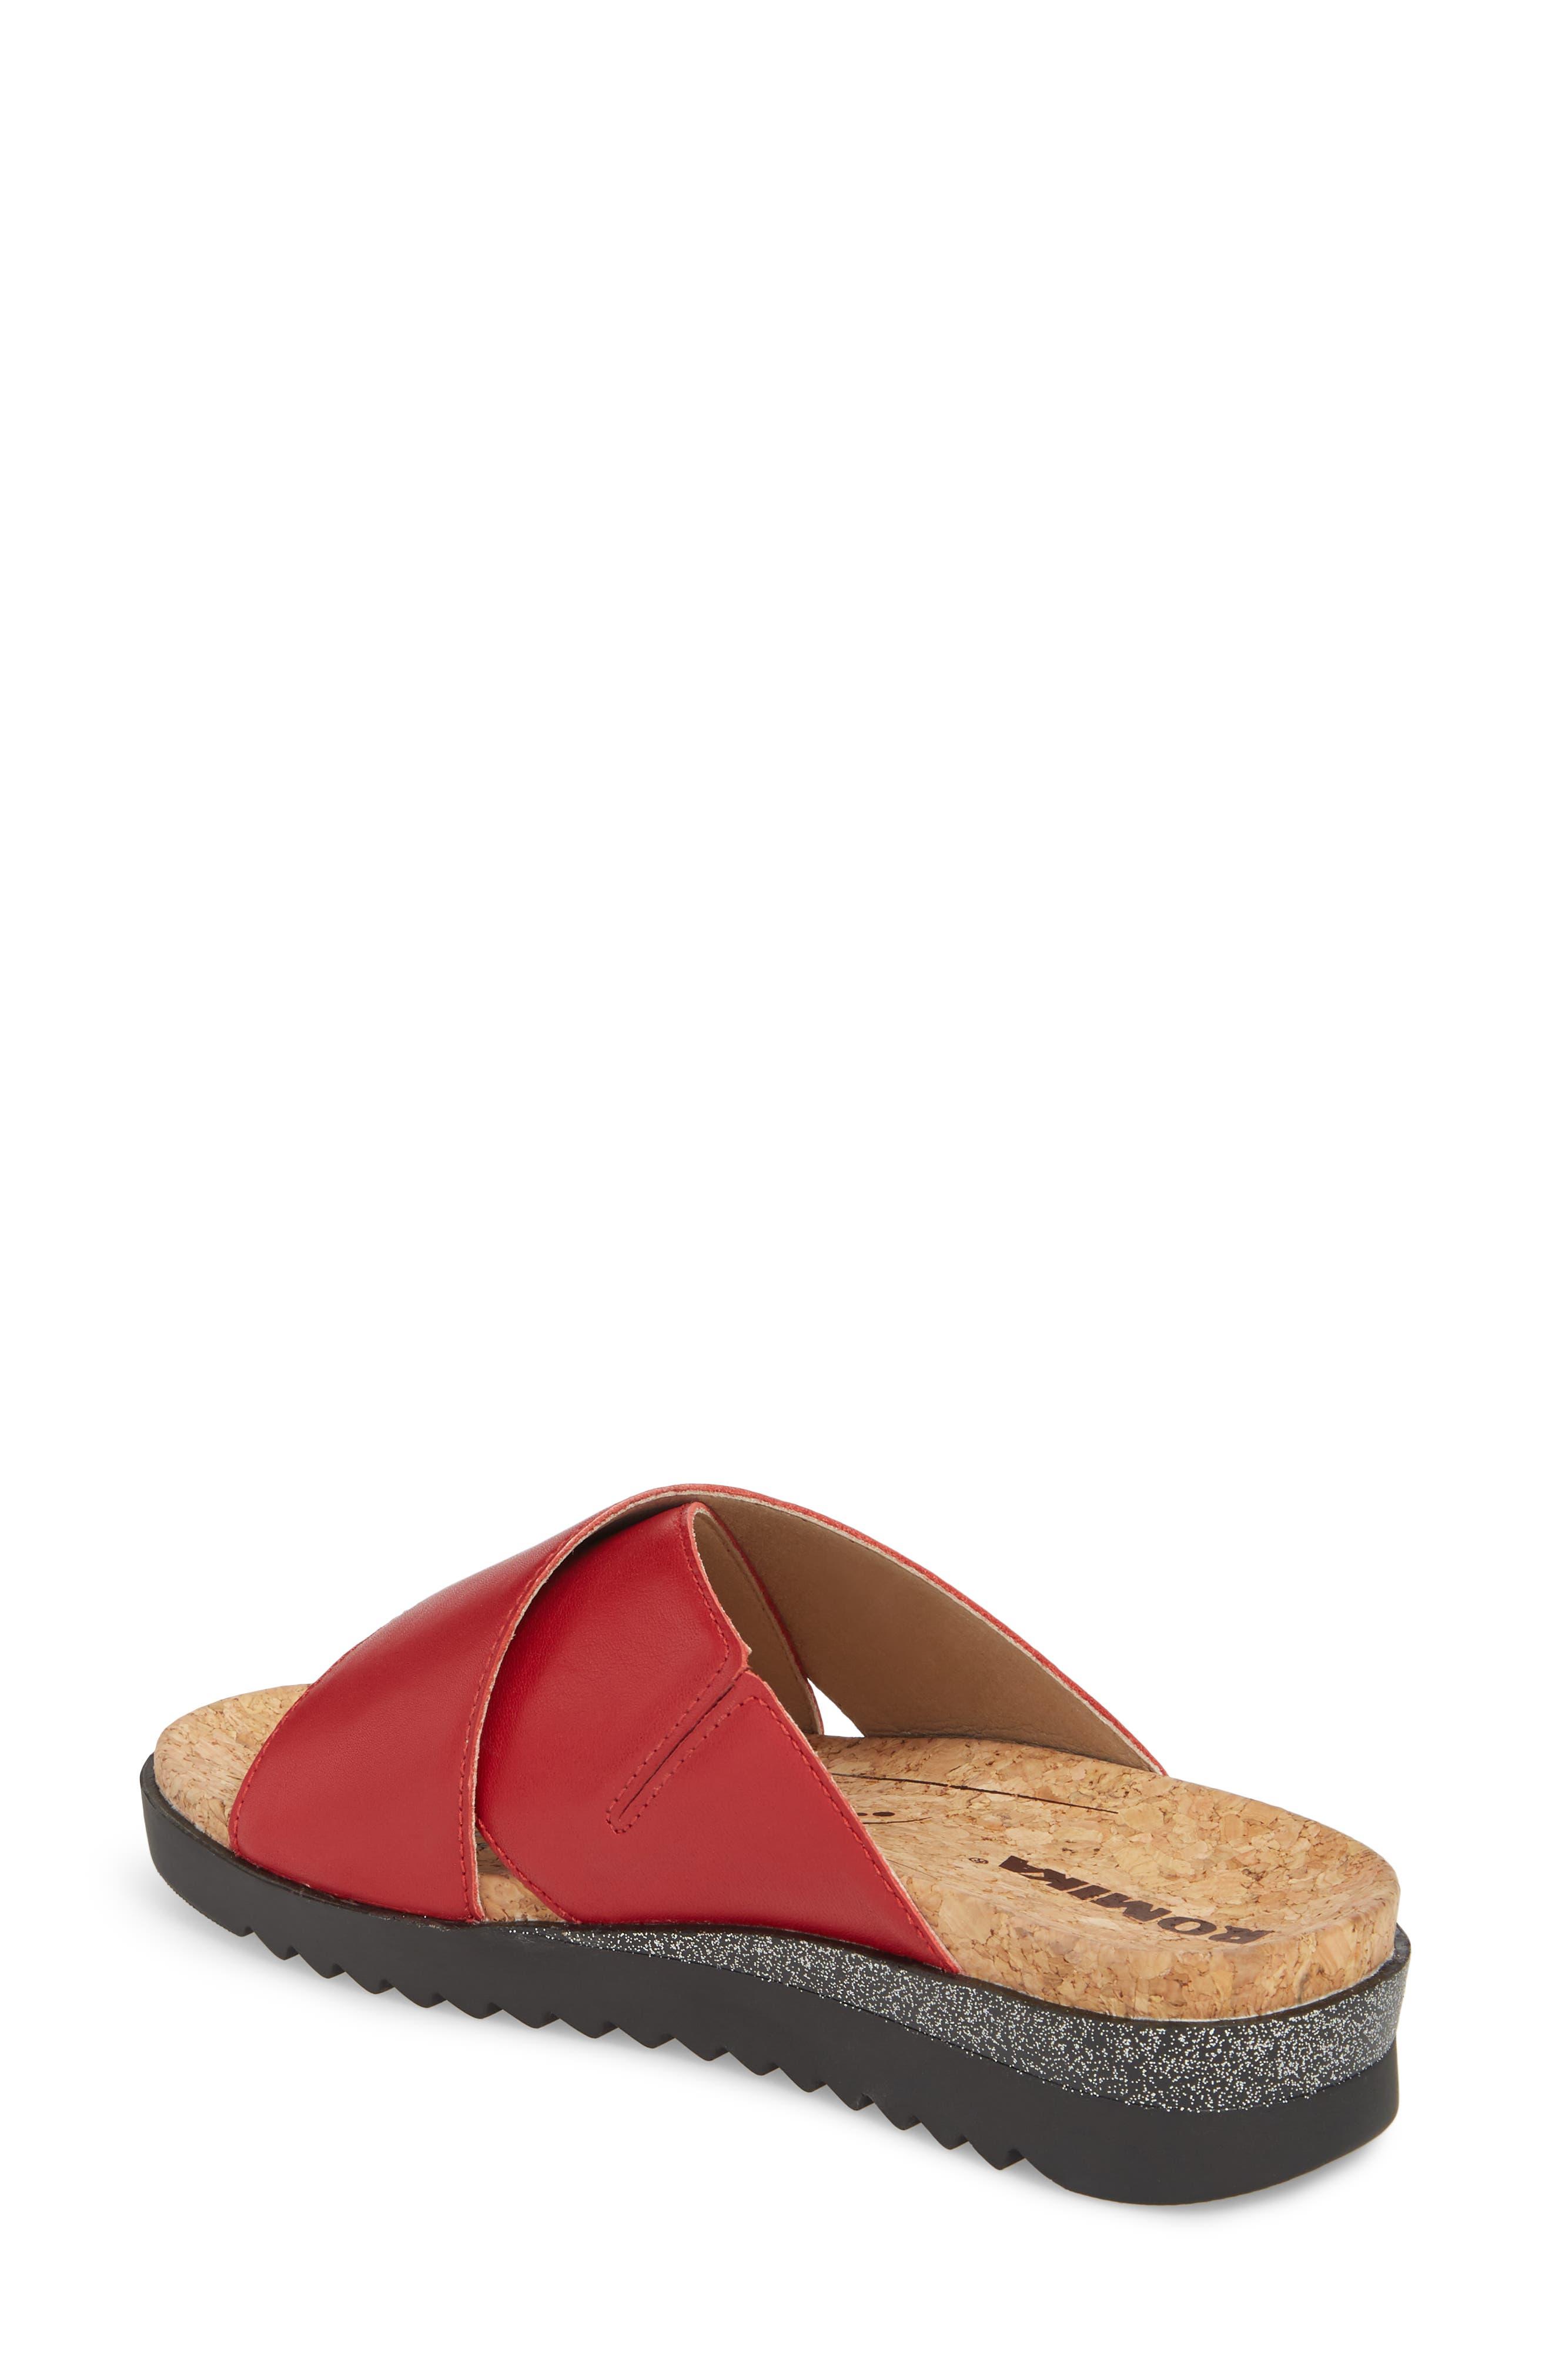 Hollywood 02 Slide Sandal,                             Alternate thumbnail 2, color,                             Red Leather